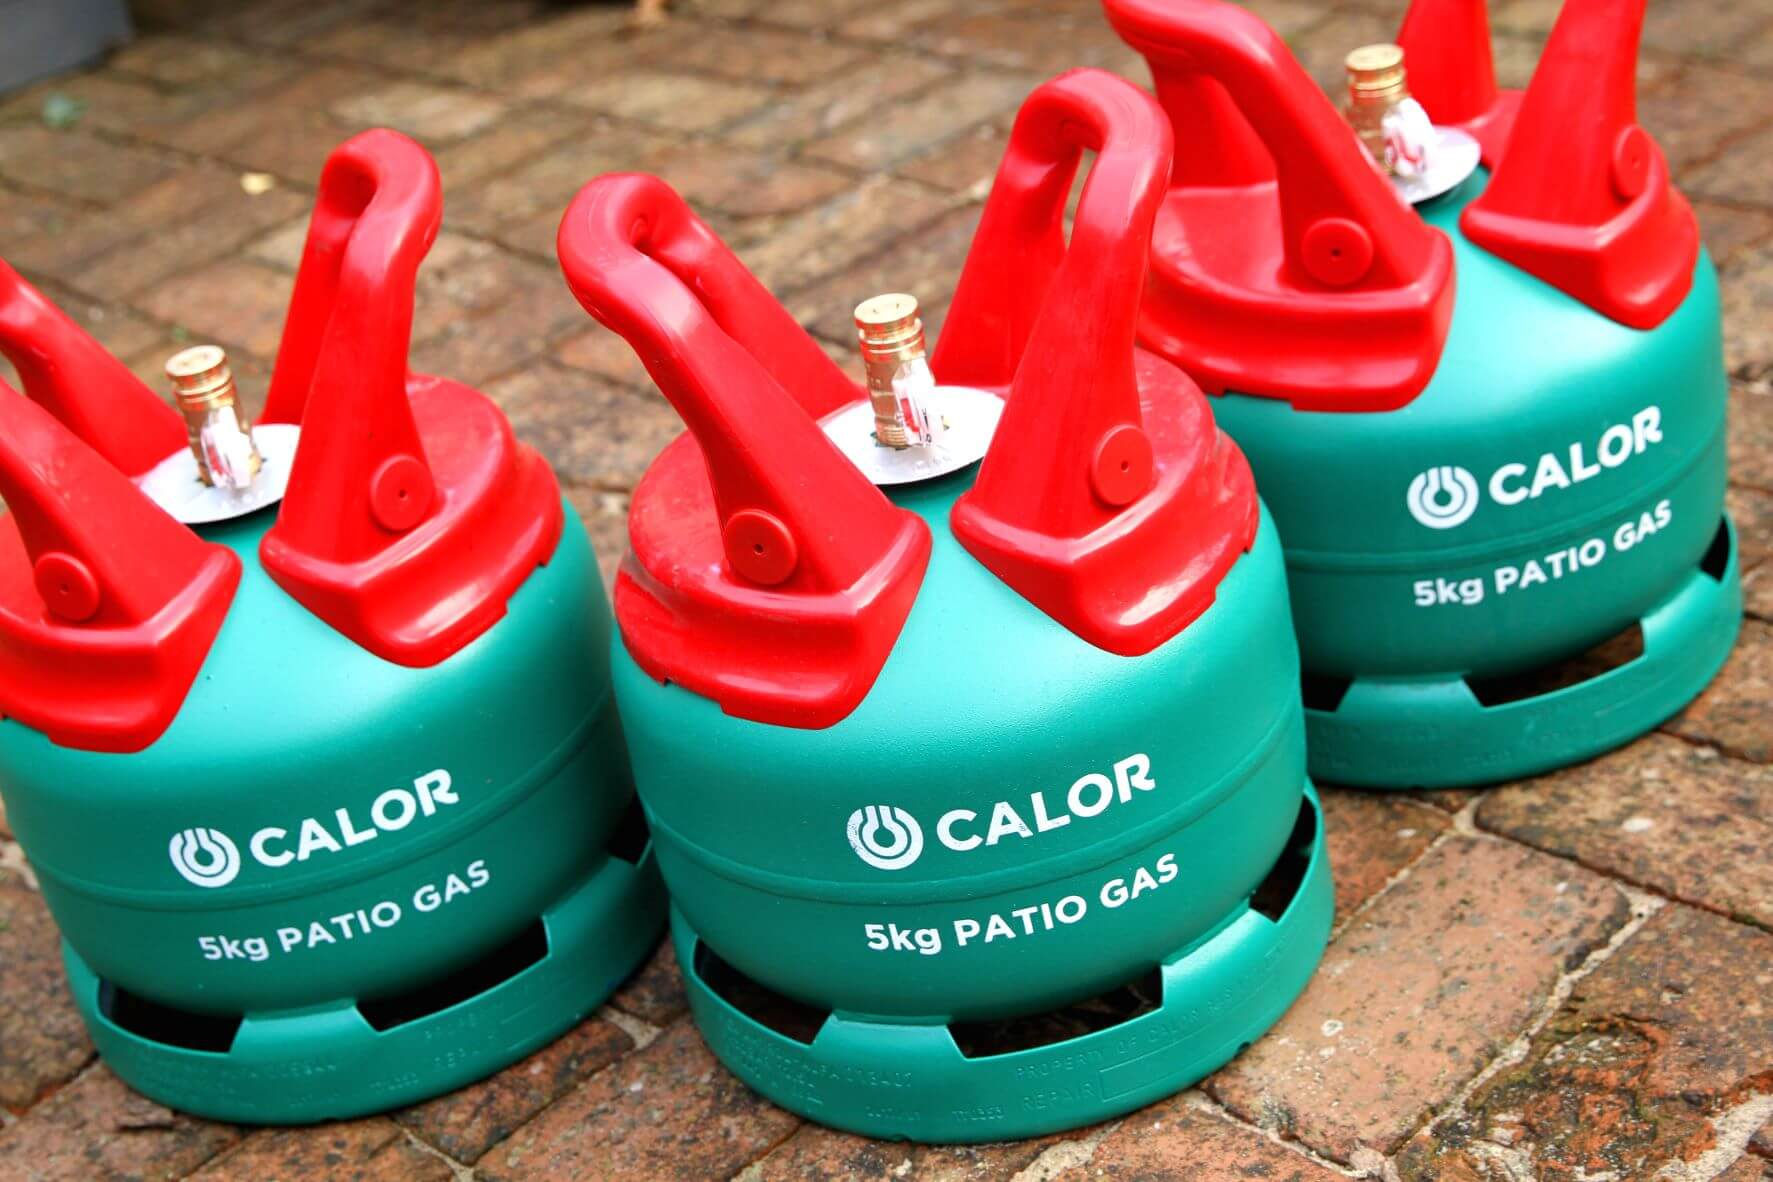 Three 5kg Calor Patio Gas bottles